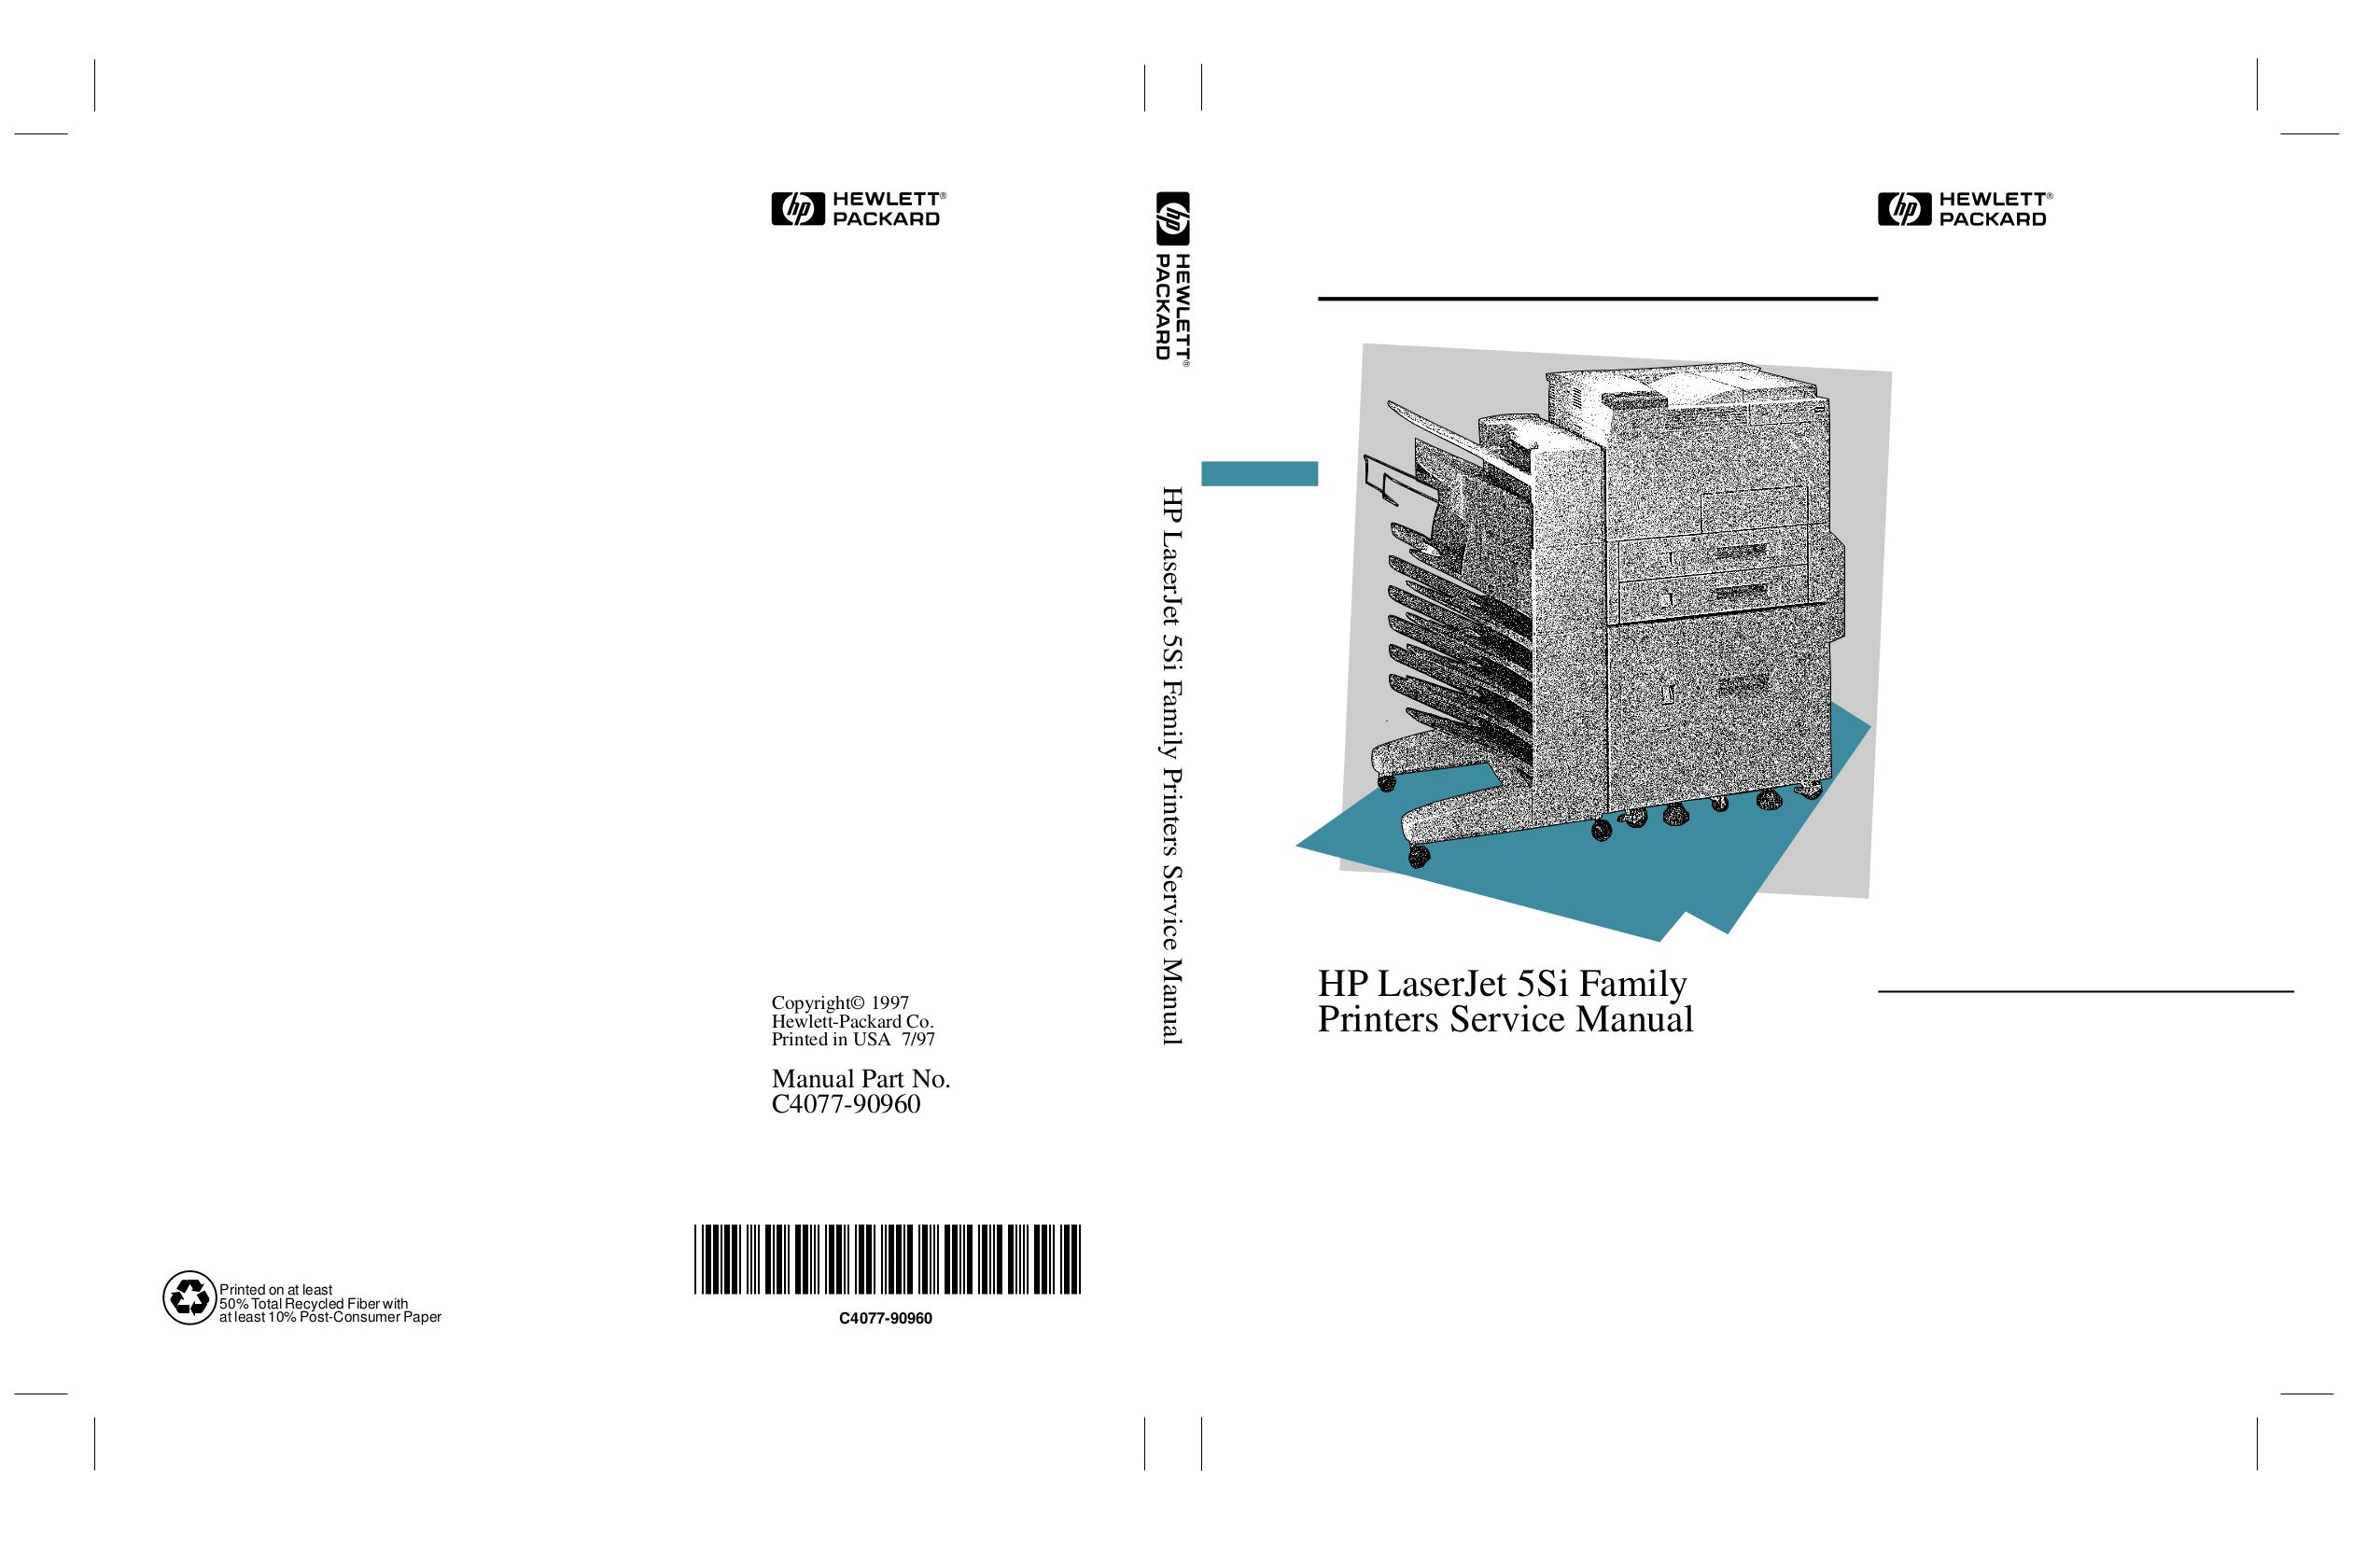 download free pdf for hp laserjet color laserjet 5si printer manual rh umlib com HP LaserJet 4 Plus Printer manual impresora hp laserjet 5si